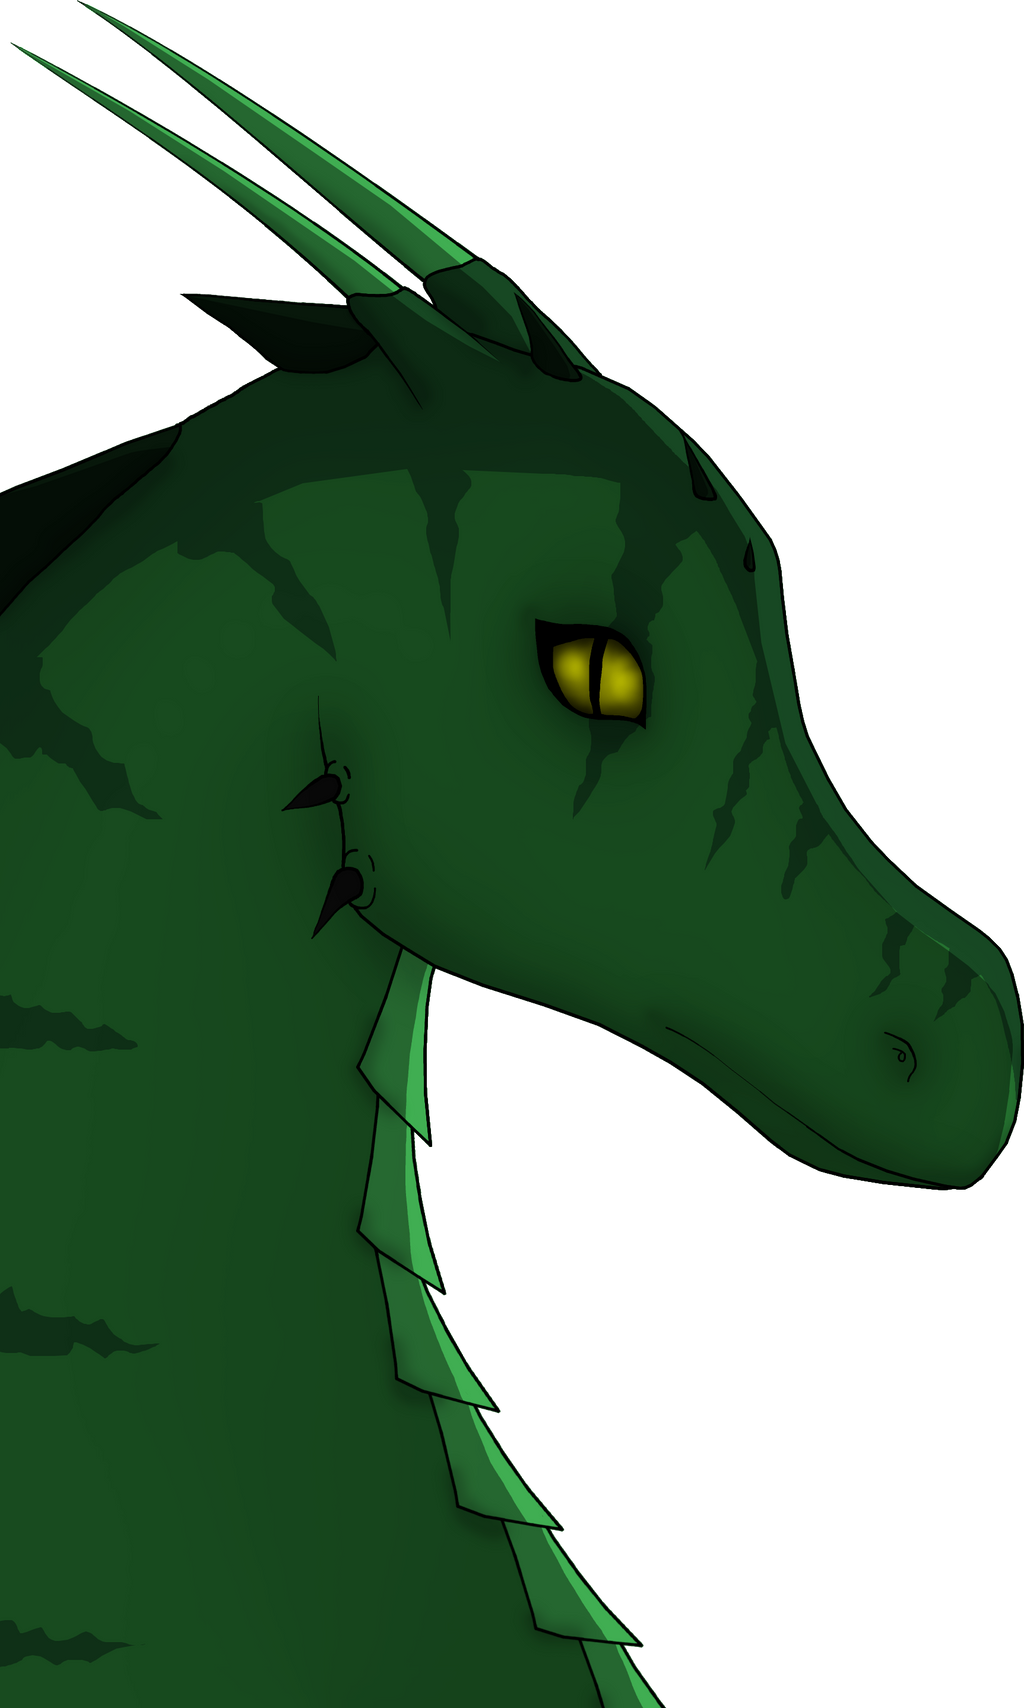 Leopardenschweif's Profile Picture